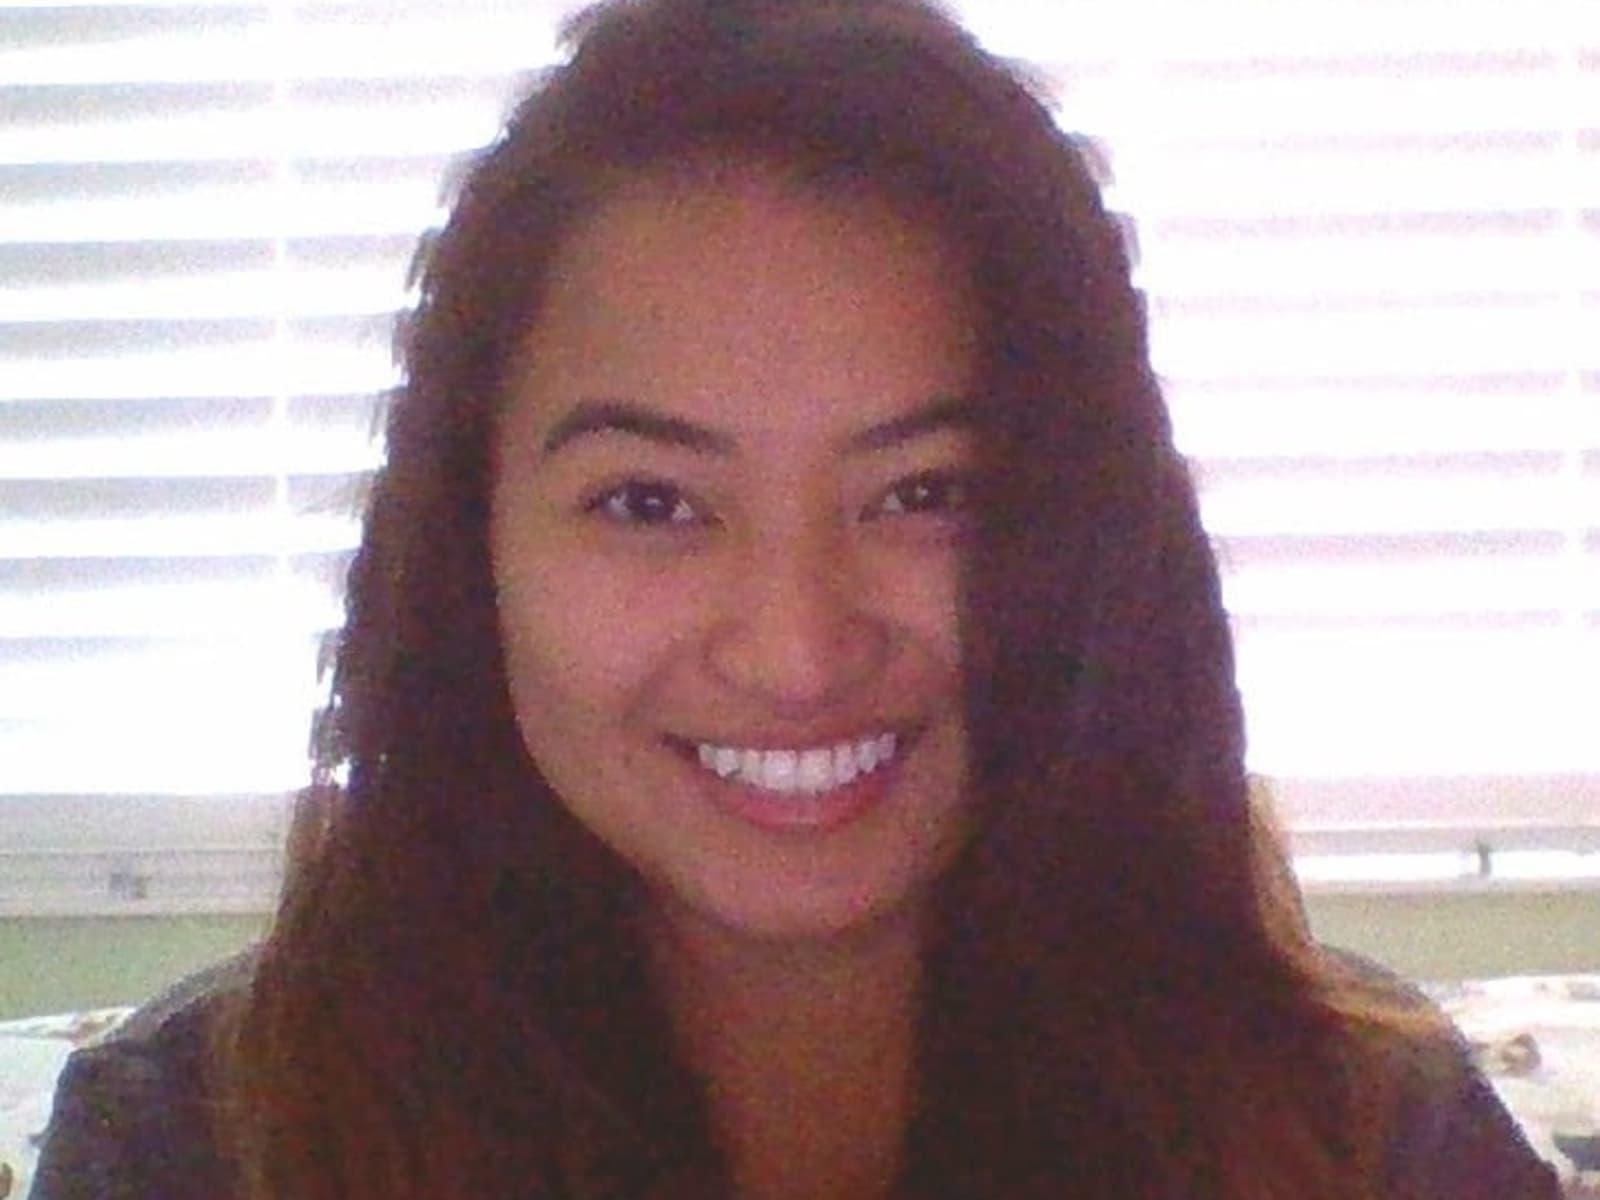 Rita from San Luis Obispo, California, United States